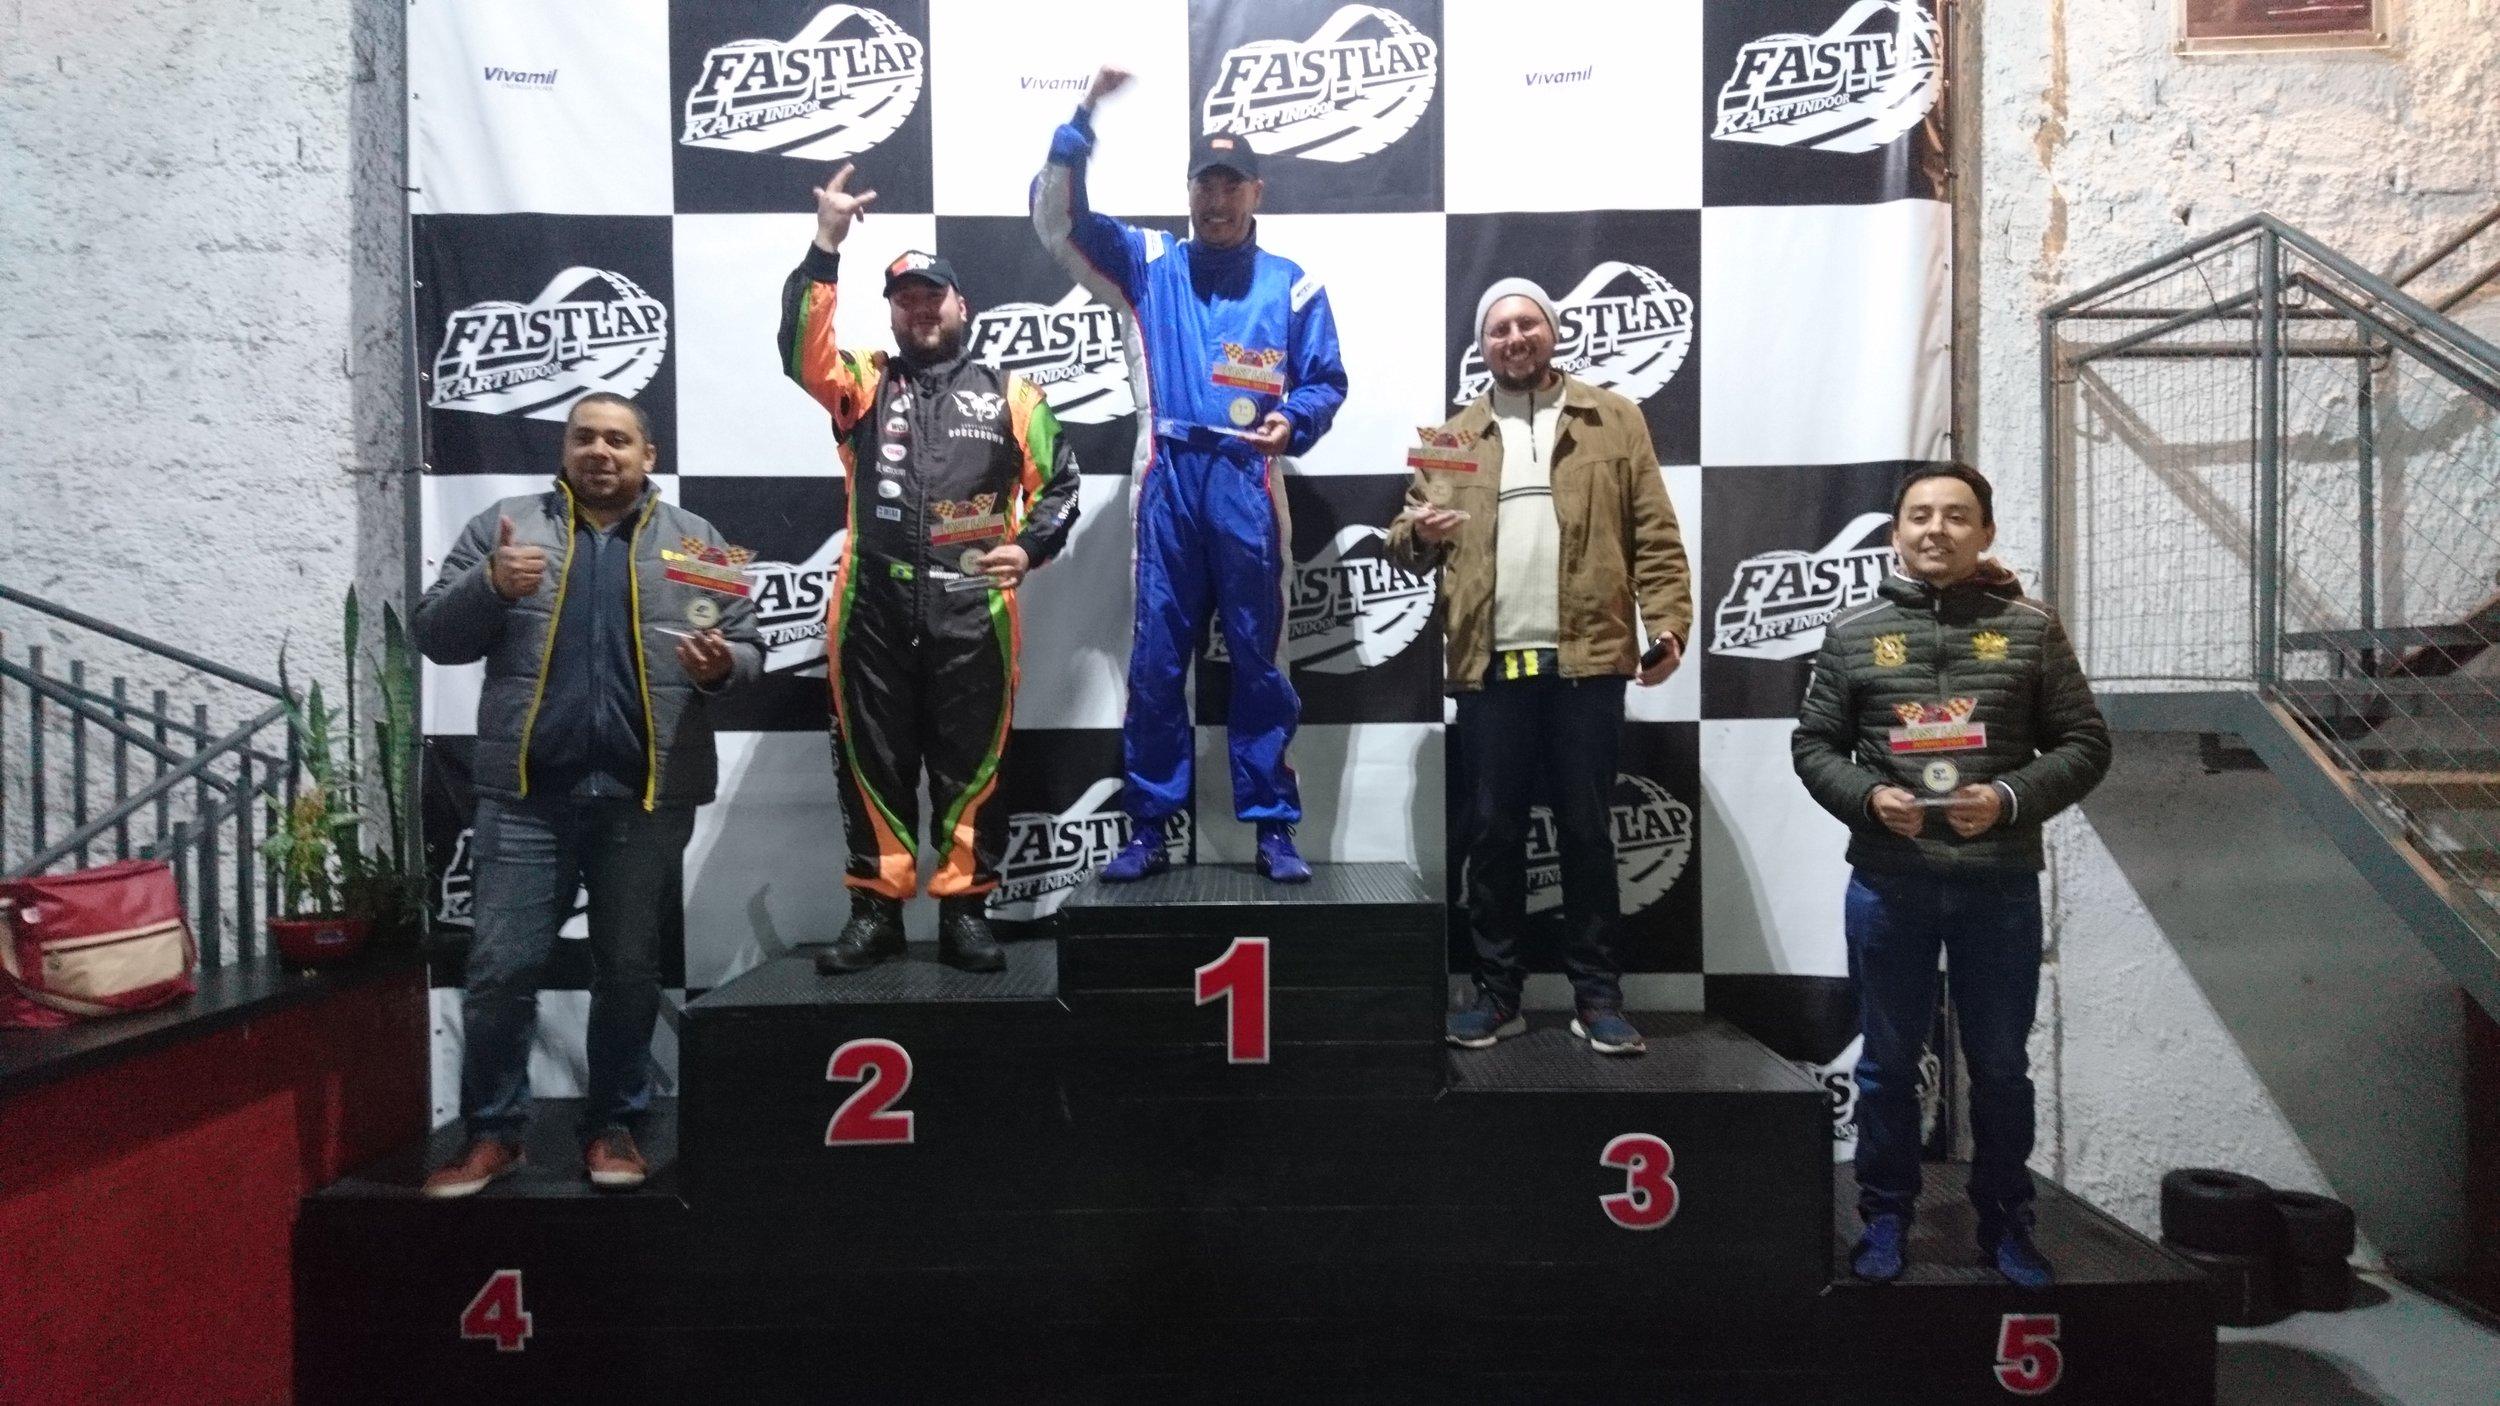 Troféu Fast Lap Junho/2019